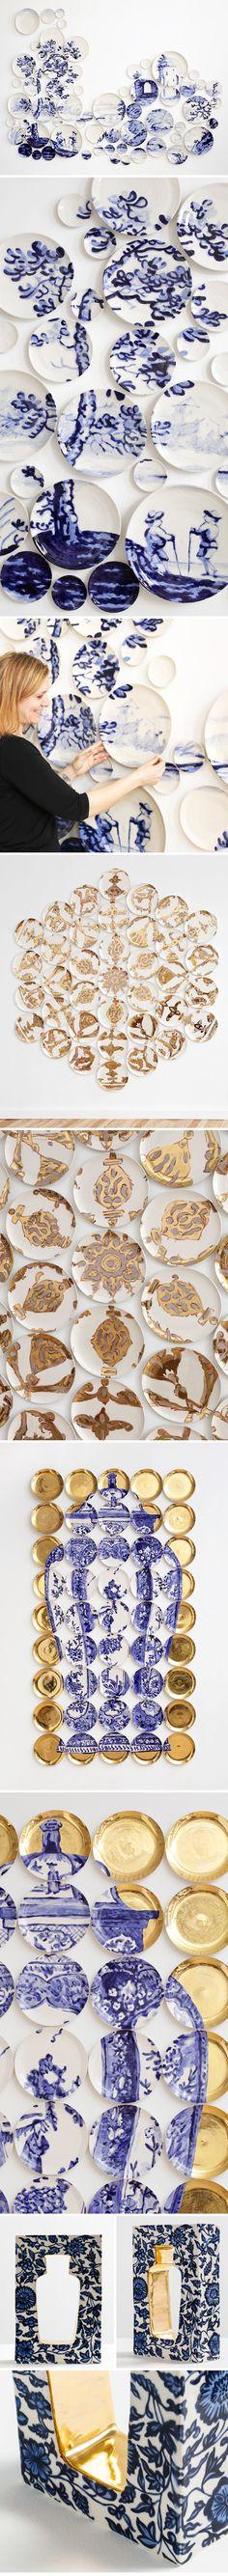 molly hatch - fine art ceramic installations <3